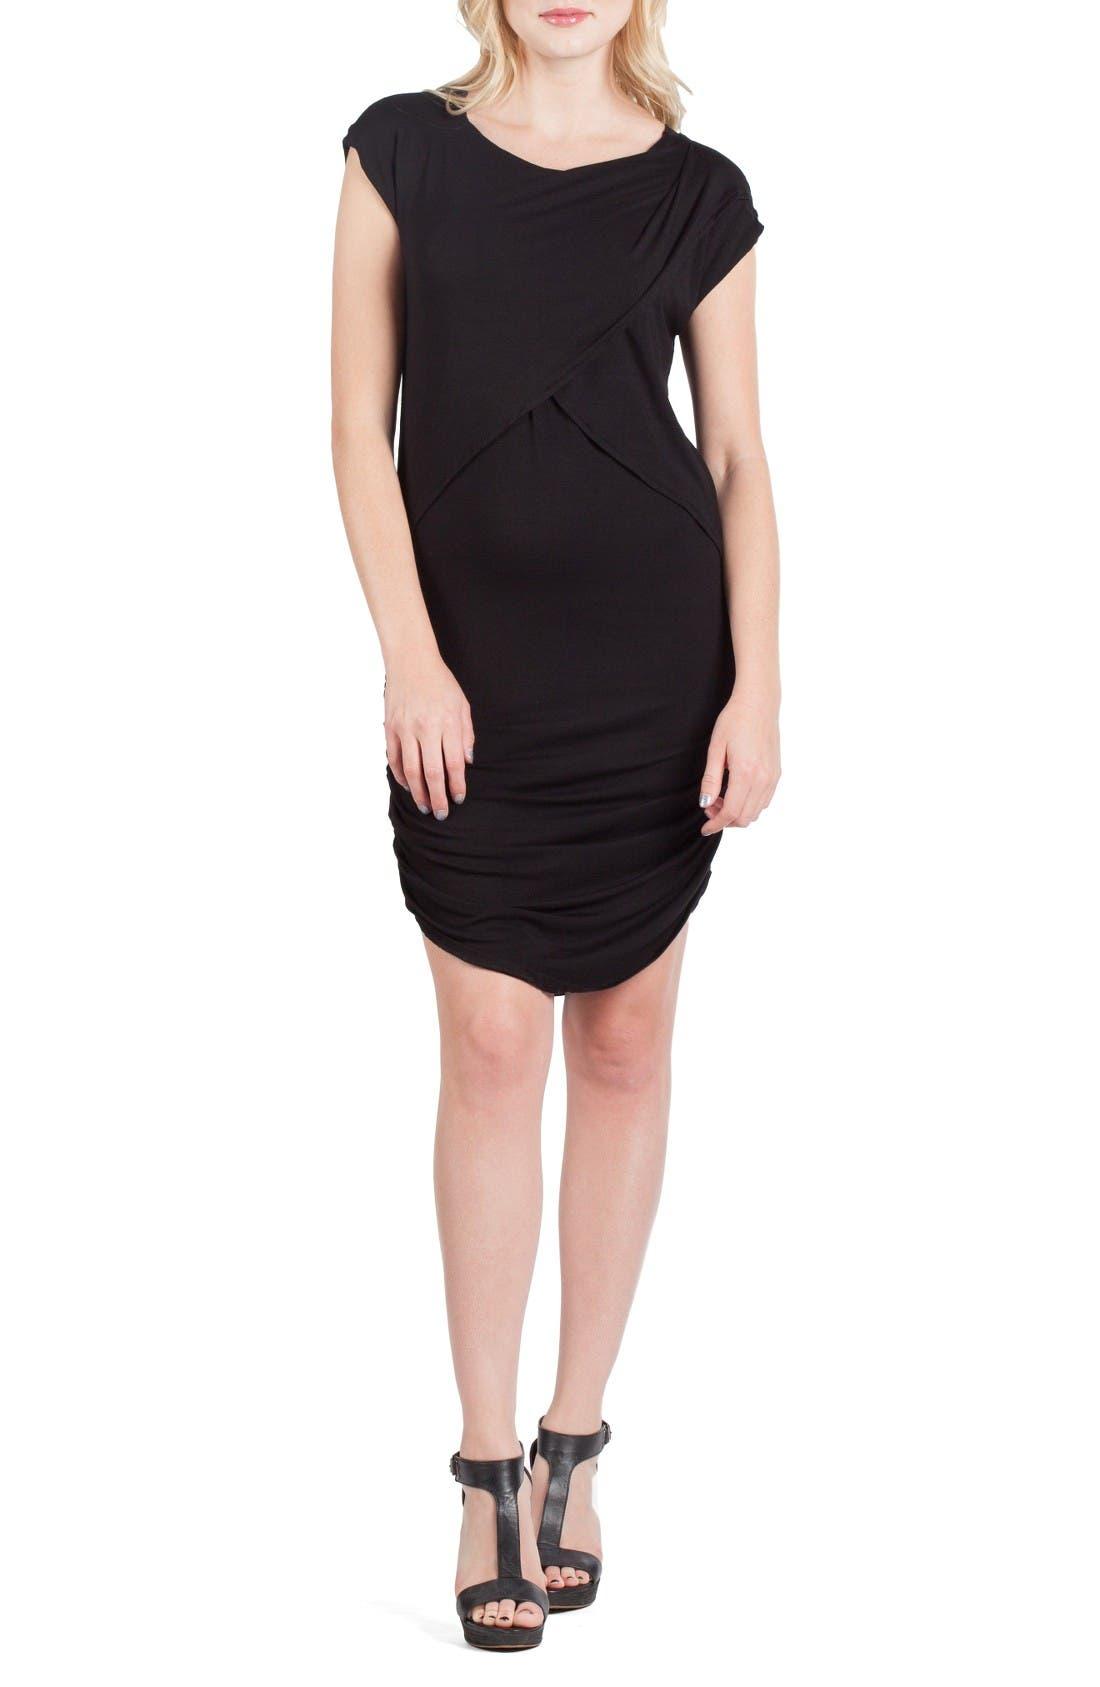 Miami Crossover Maternity/Nursing Sheath Dress,                             Main thumbnail 1, color,                             Black